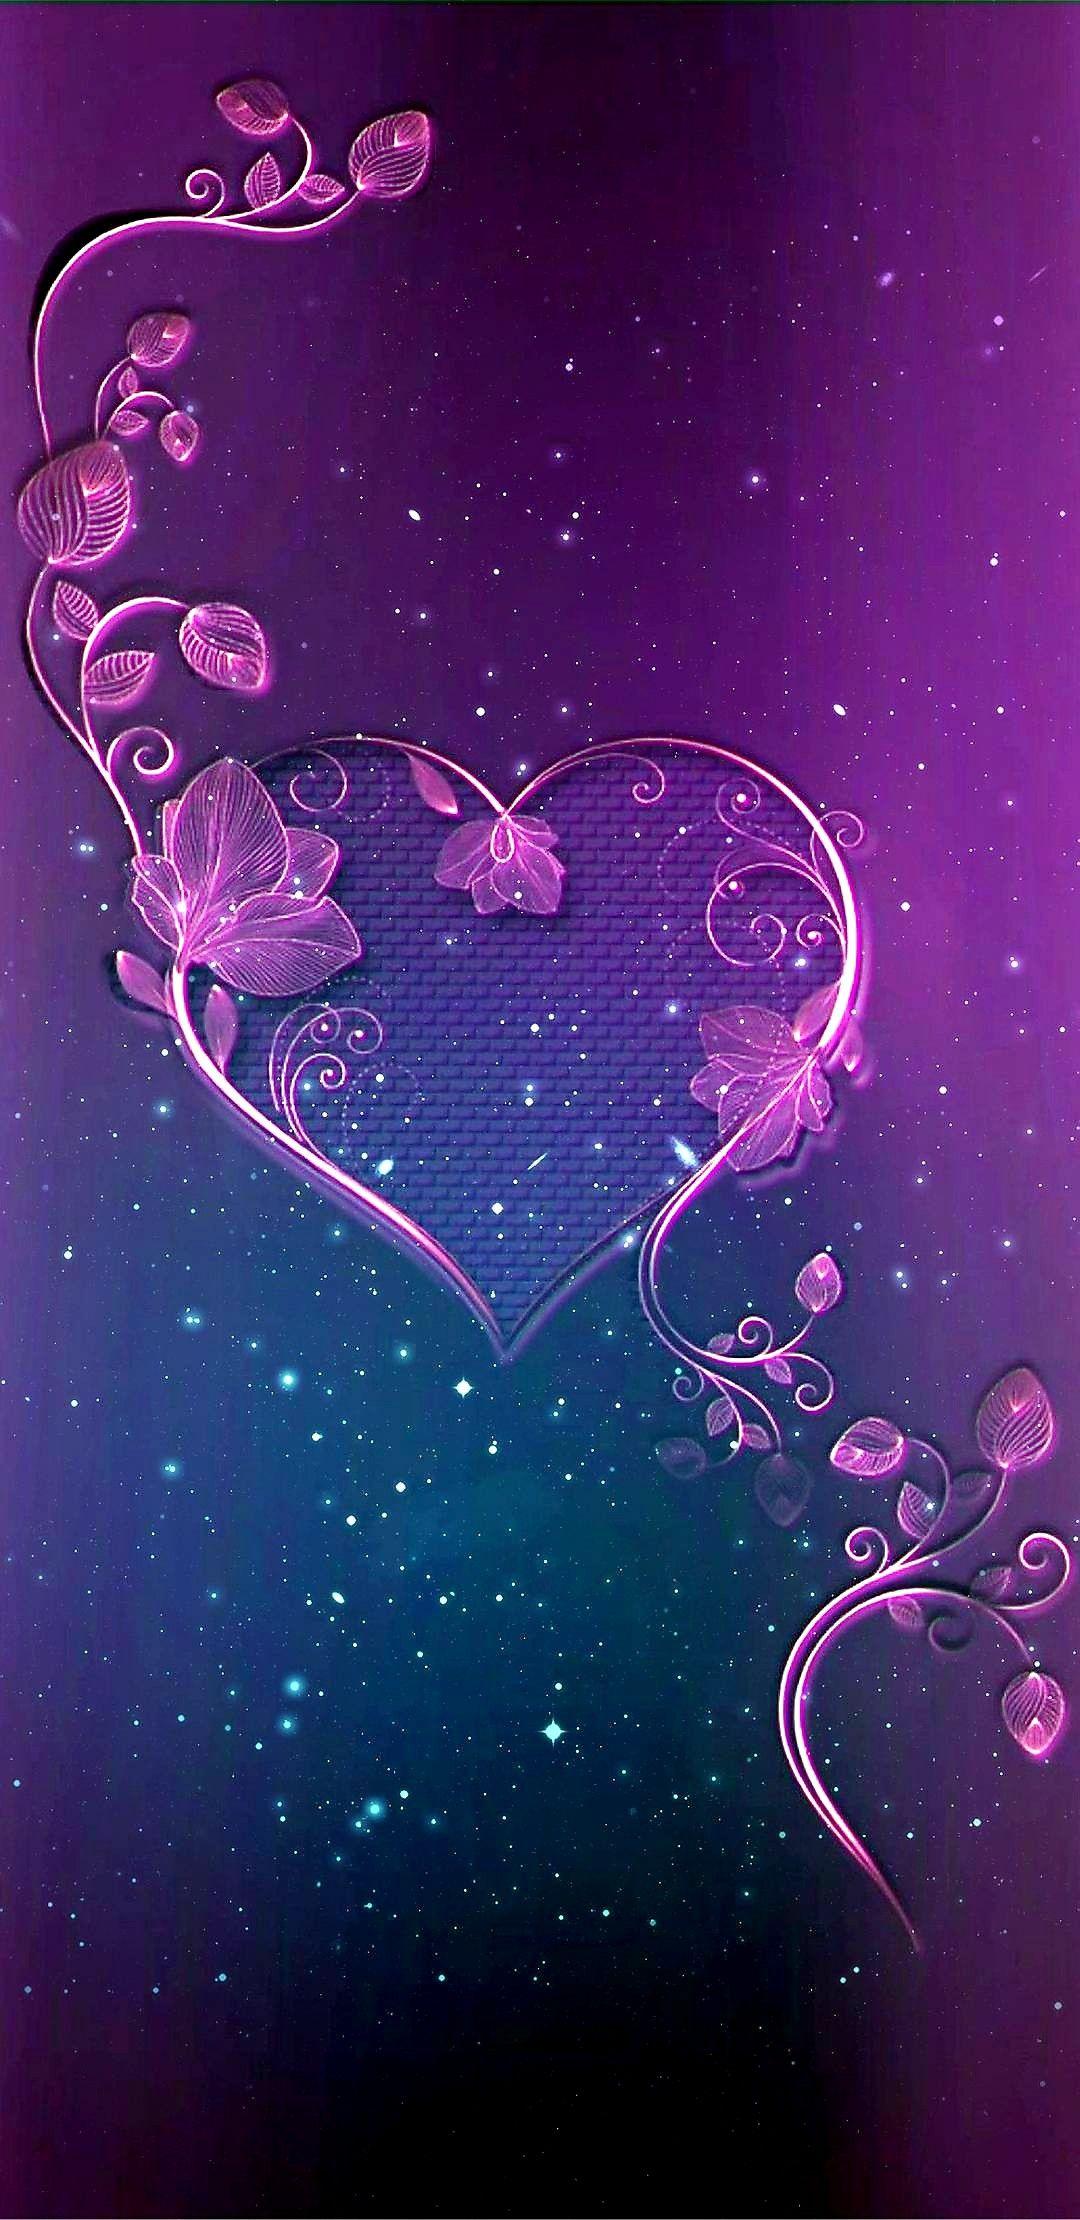 Pin By Phyllis Klockgether On Heart Wallpaper 1 Heart Iphone Wallpaper Heart Wallpaper Cute Galaxy Wallpaper